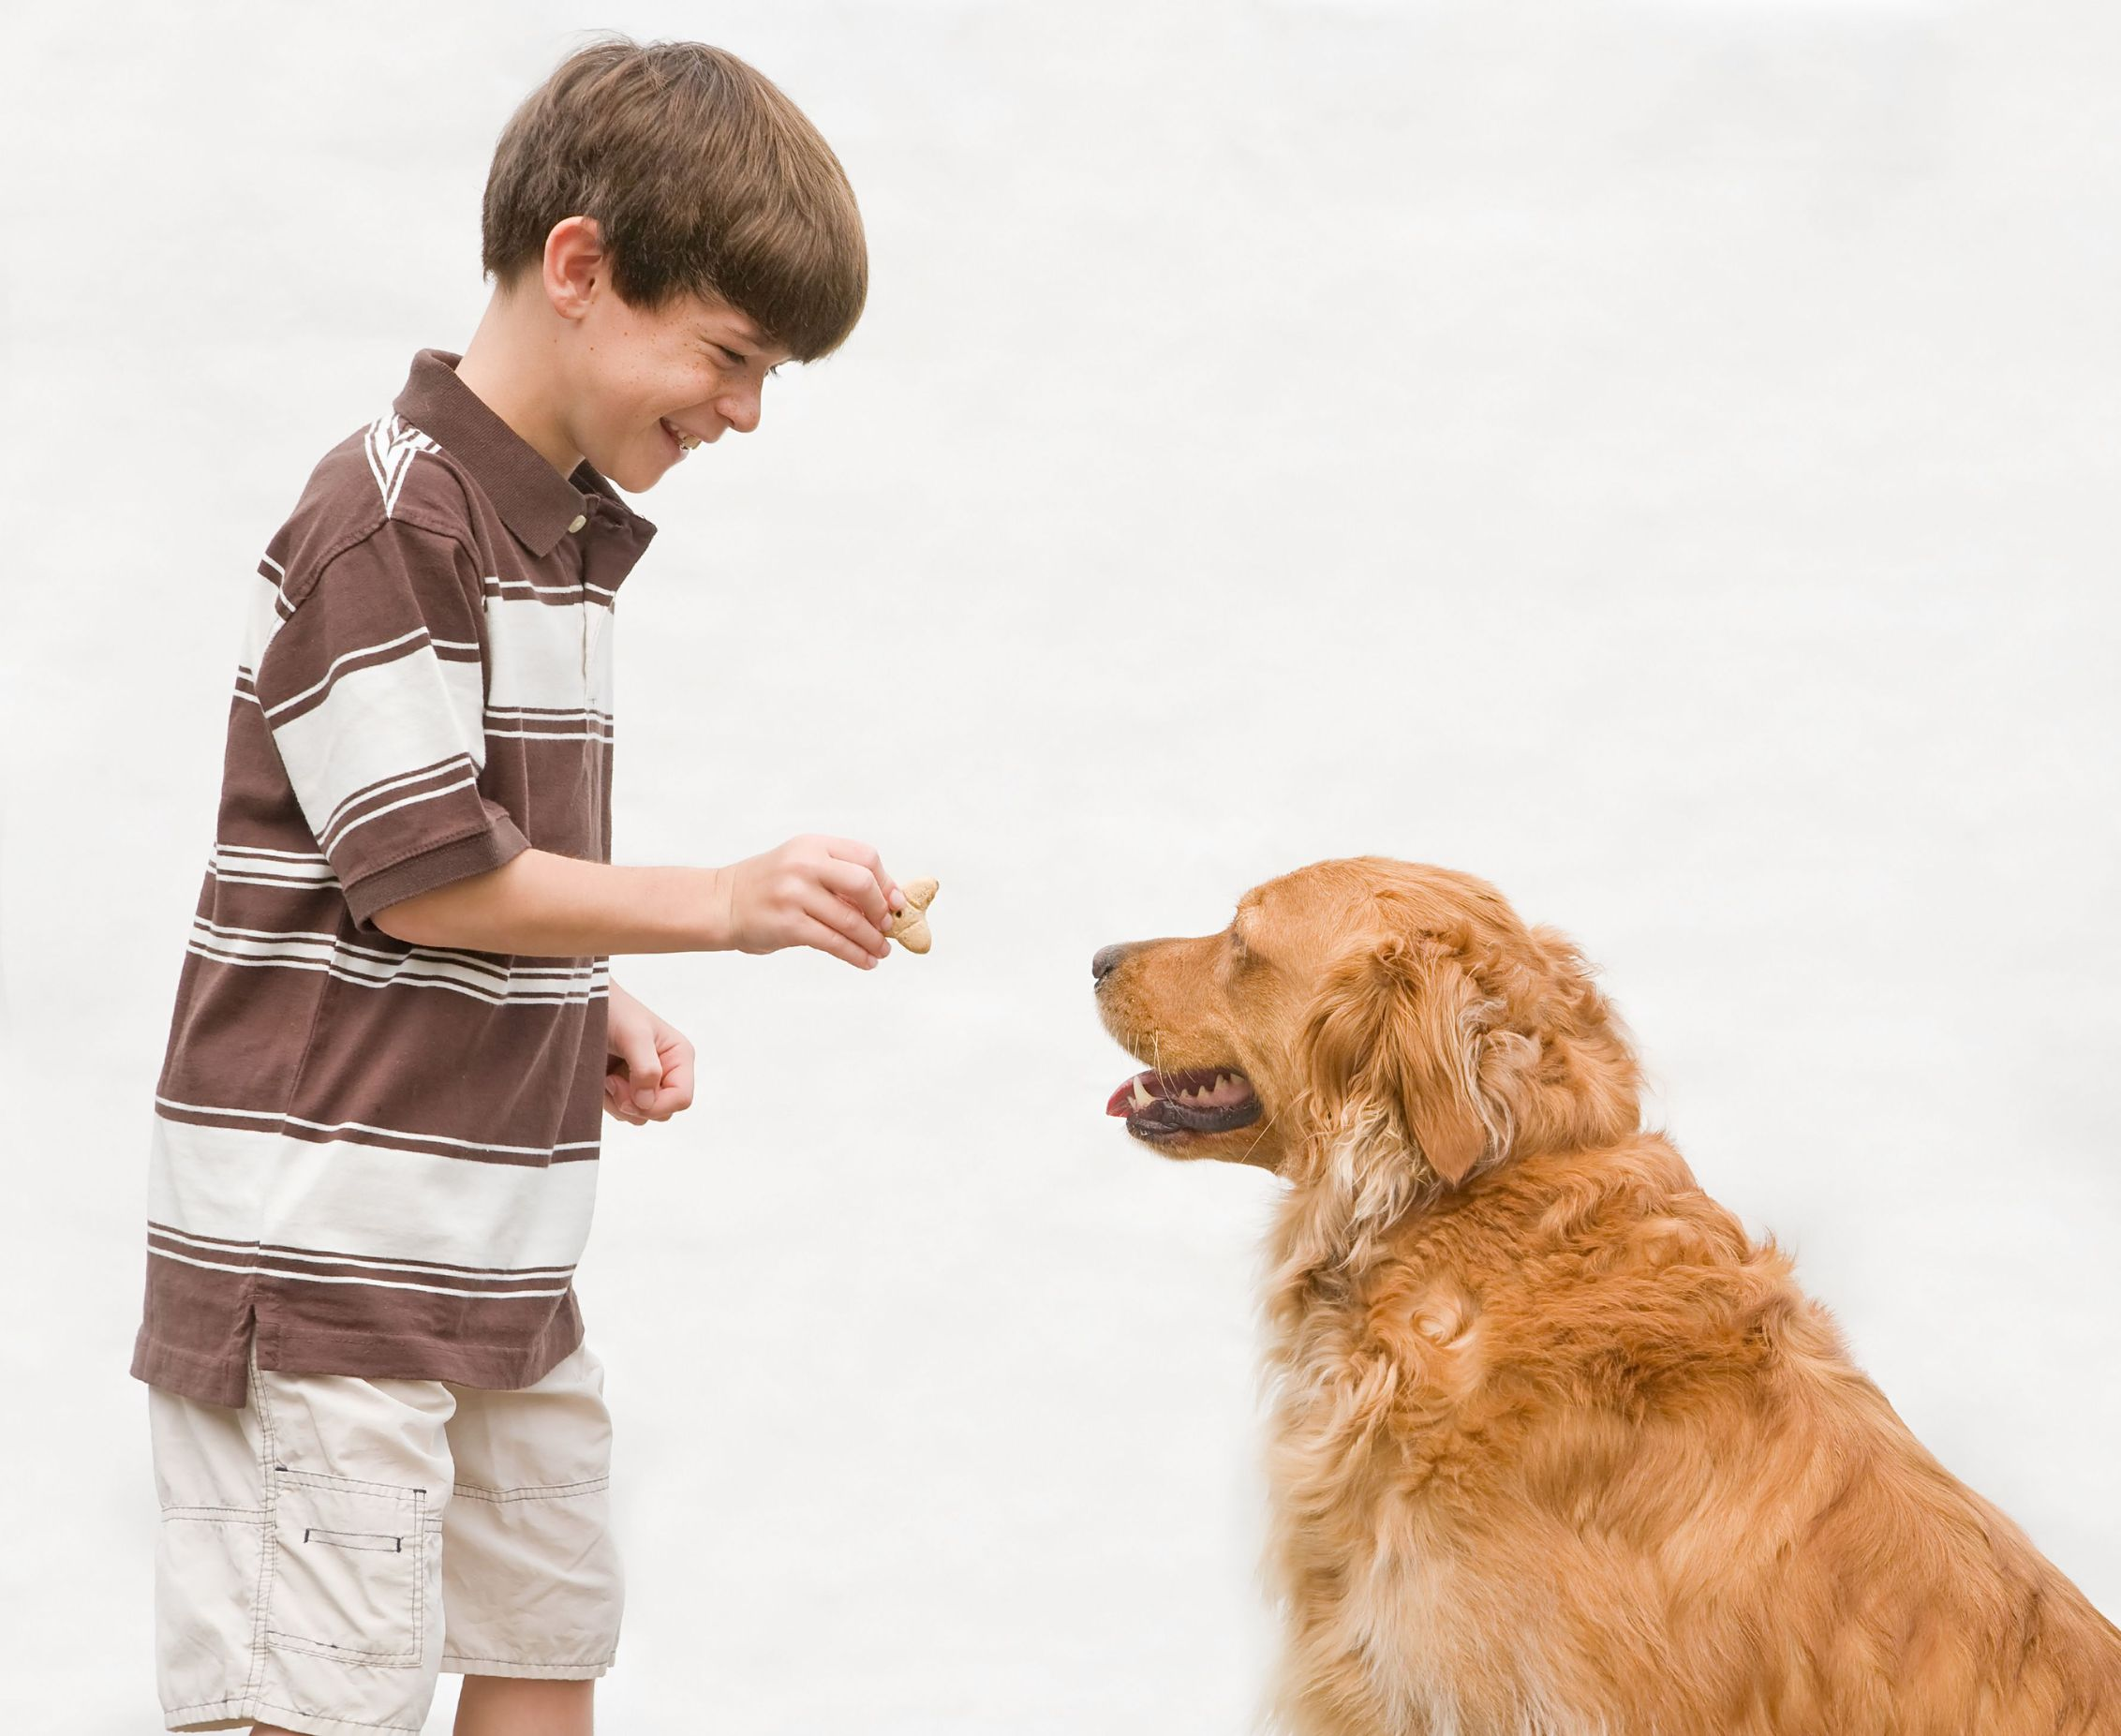 Fullsize Of Treat A Dog